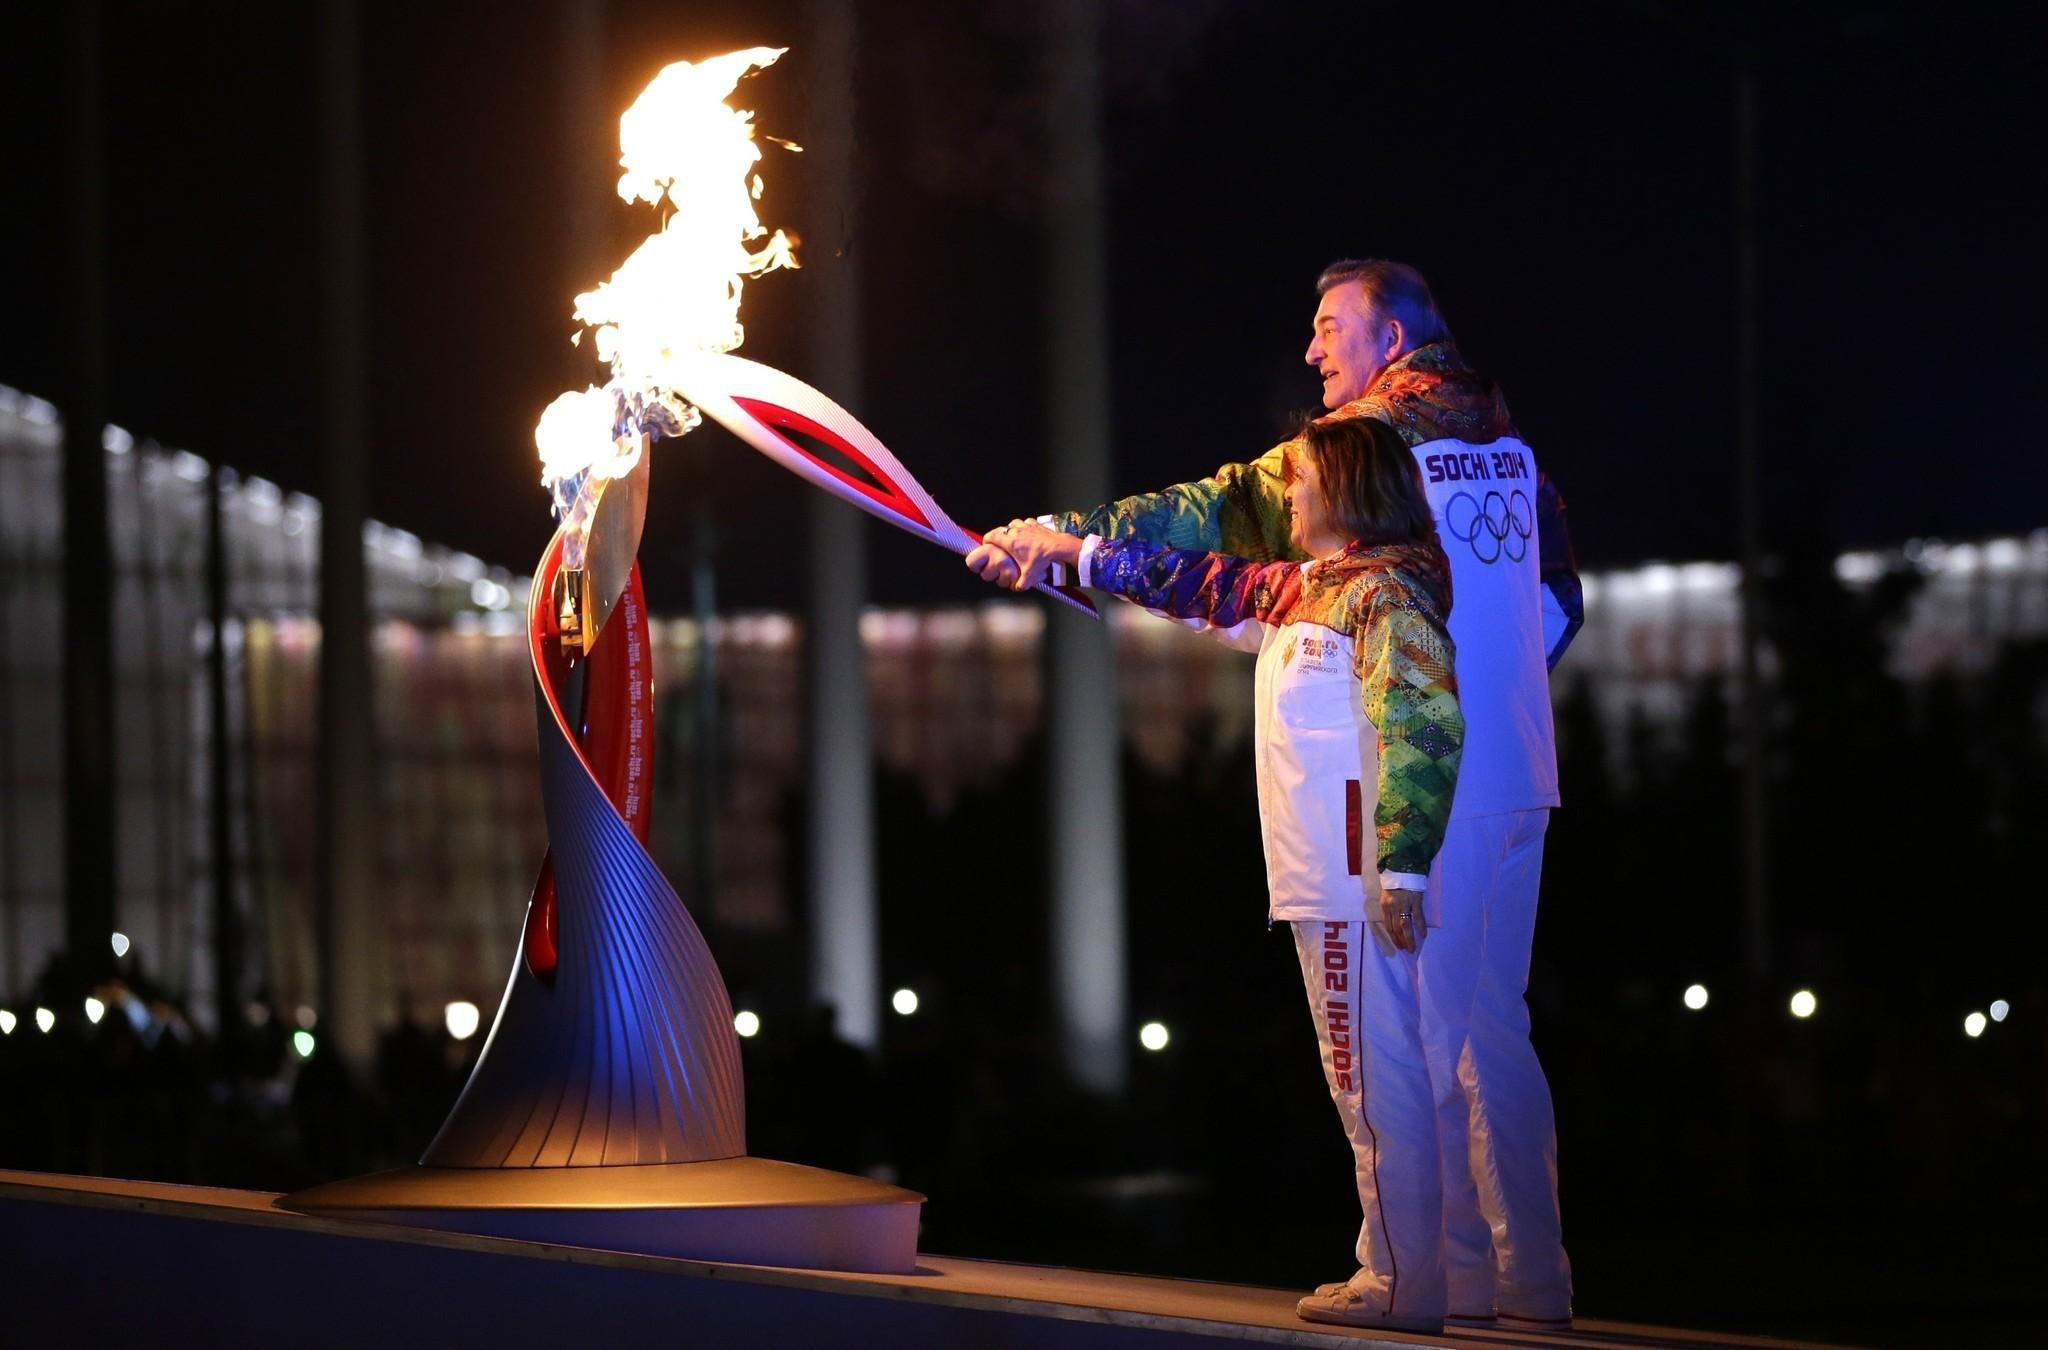 Irina Rodnina and Vladislav Tretyak lit the Olympic flame in Sochi 80